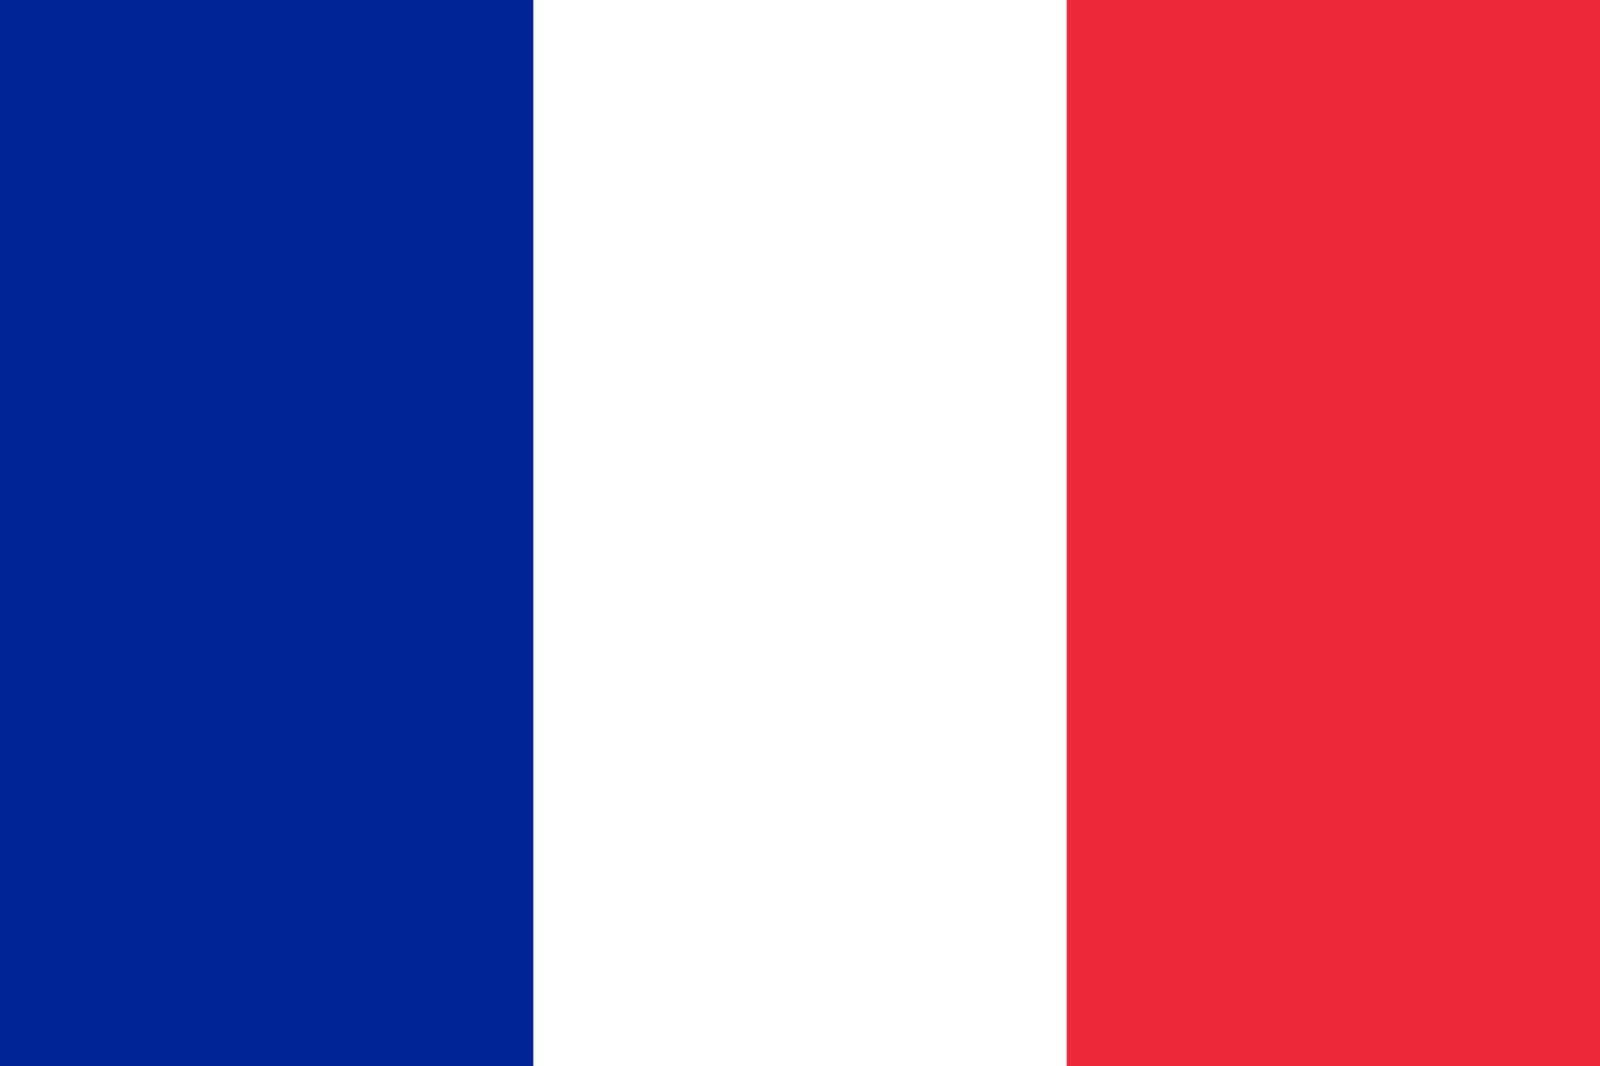 Registro Brasfoot 2015 - Patch França 50 Equipes